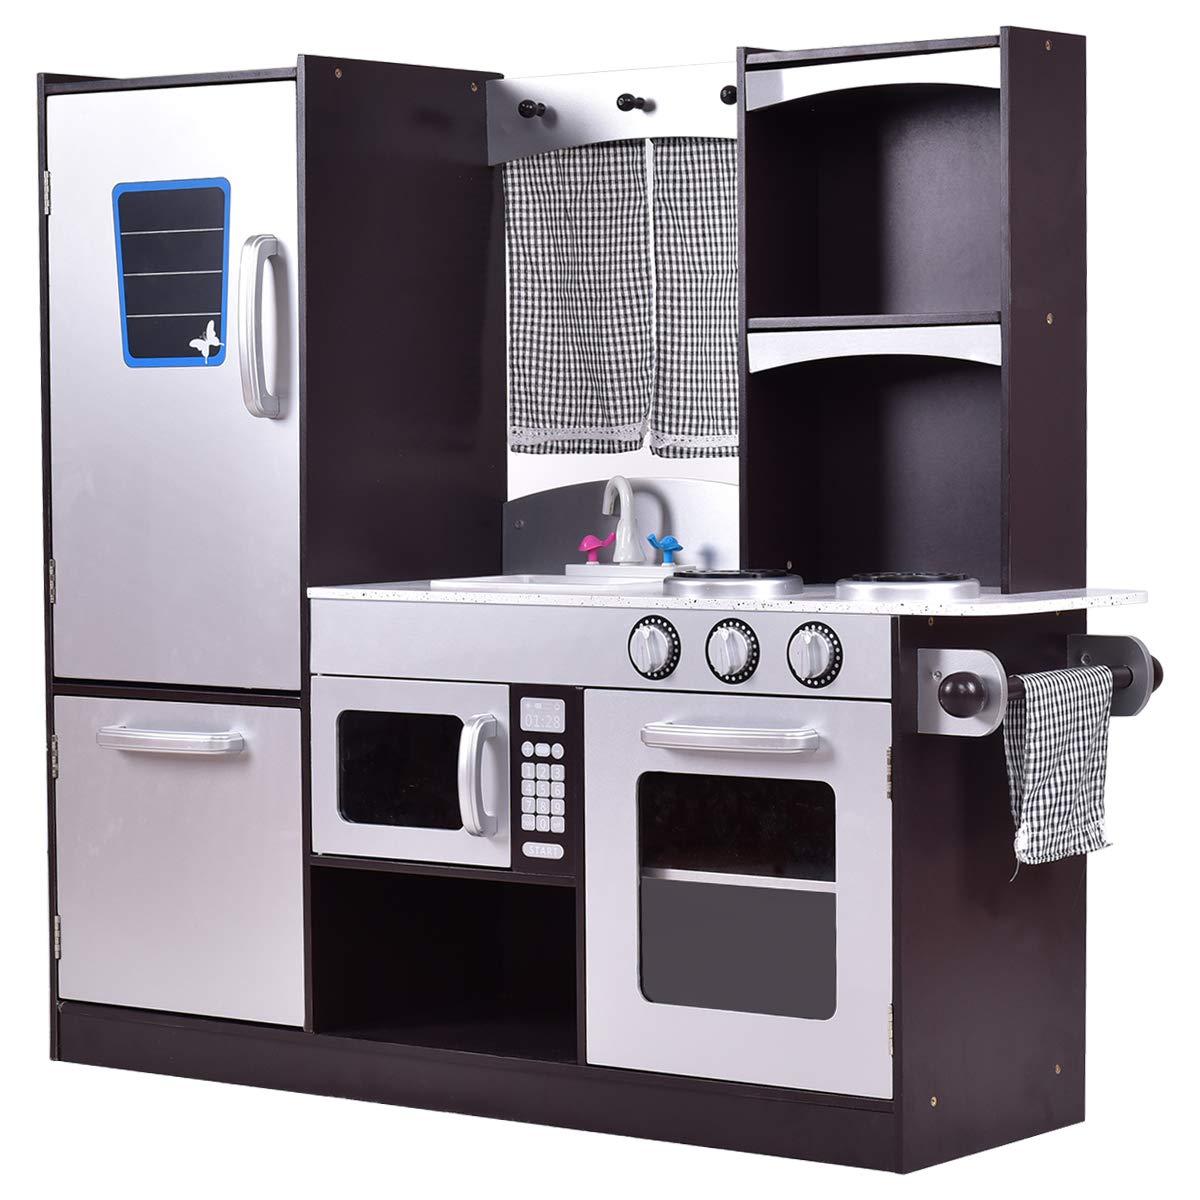 Costzon Kids Kitchen Playset, Wooden Cookware Pretend Cooking Food Set Toddler Gift Toy (37.4'' Height, Espresso)